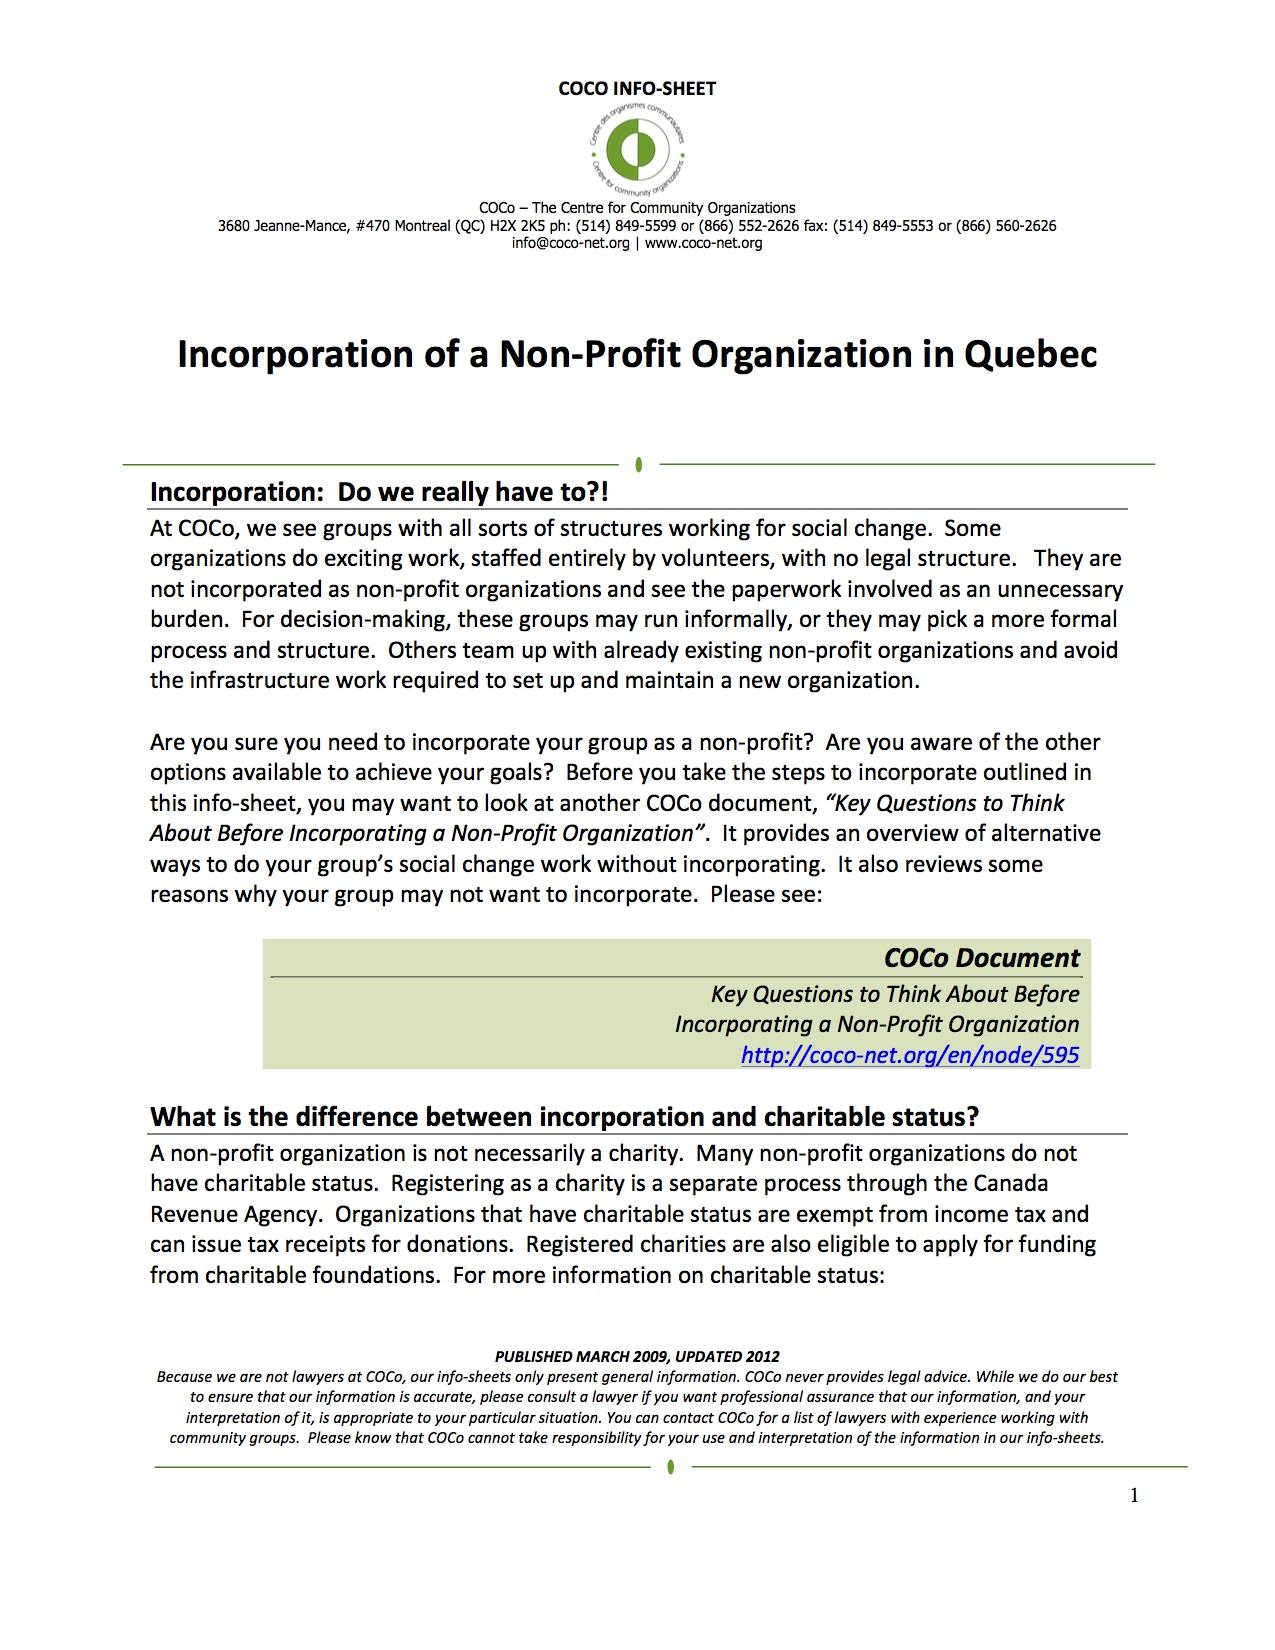 Incorporation of a Non-Profit Organization in Quebec - COCo